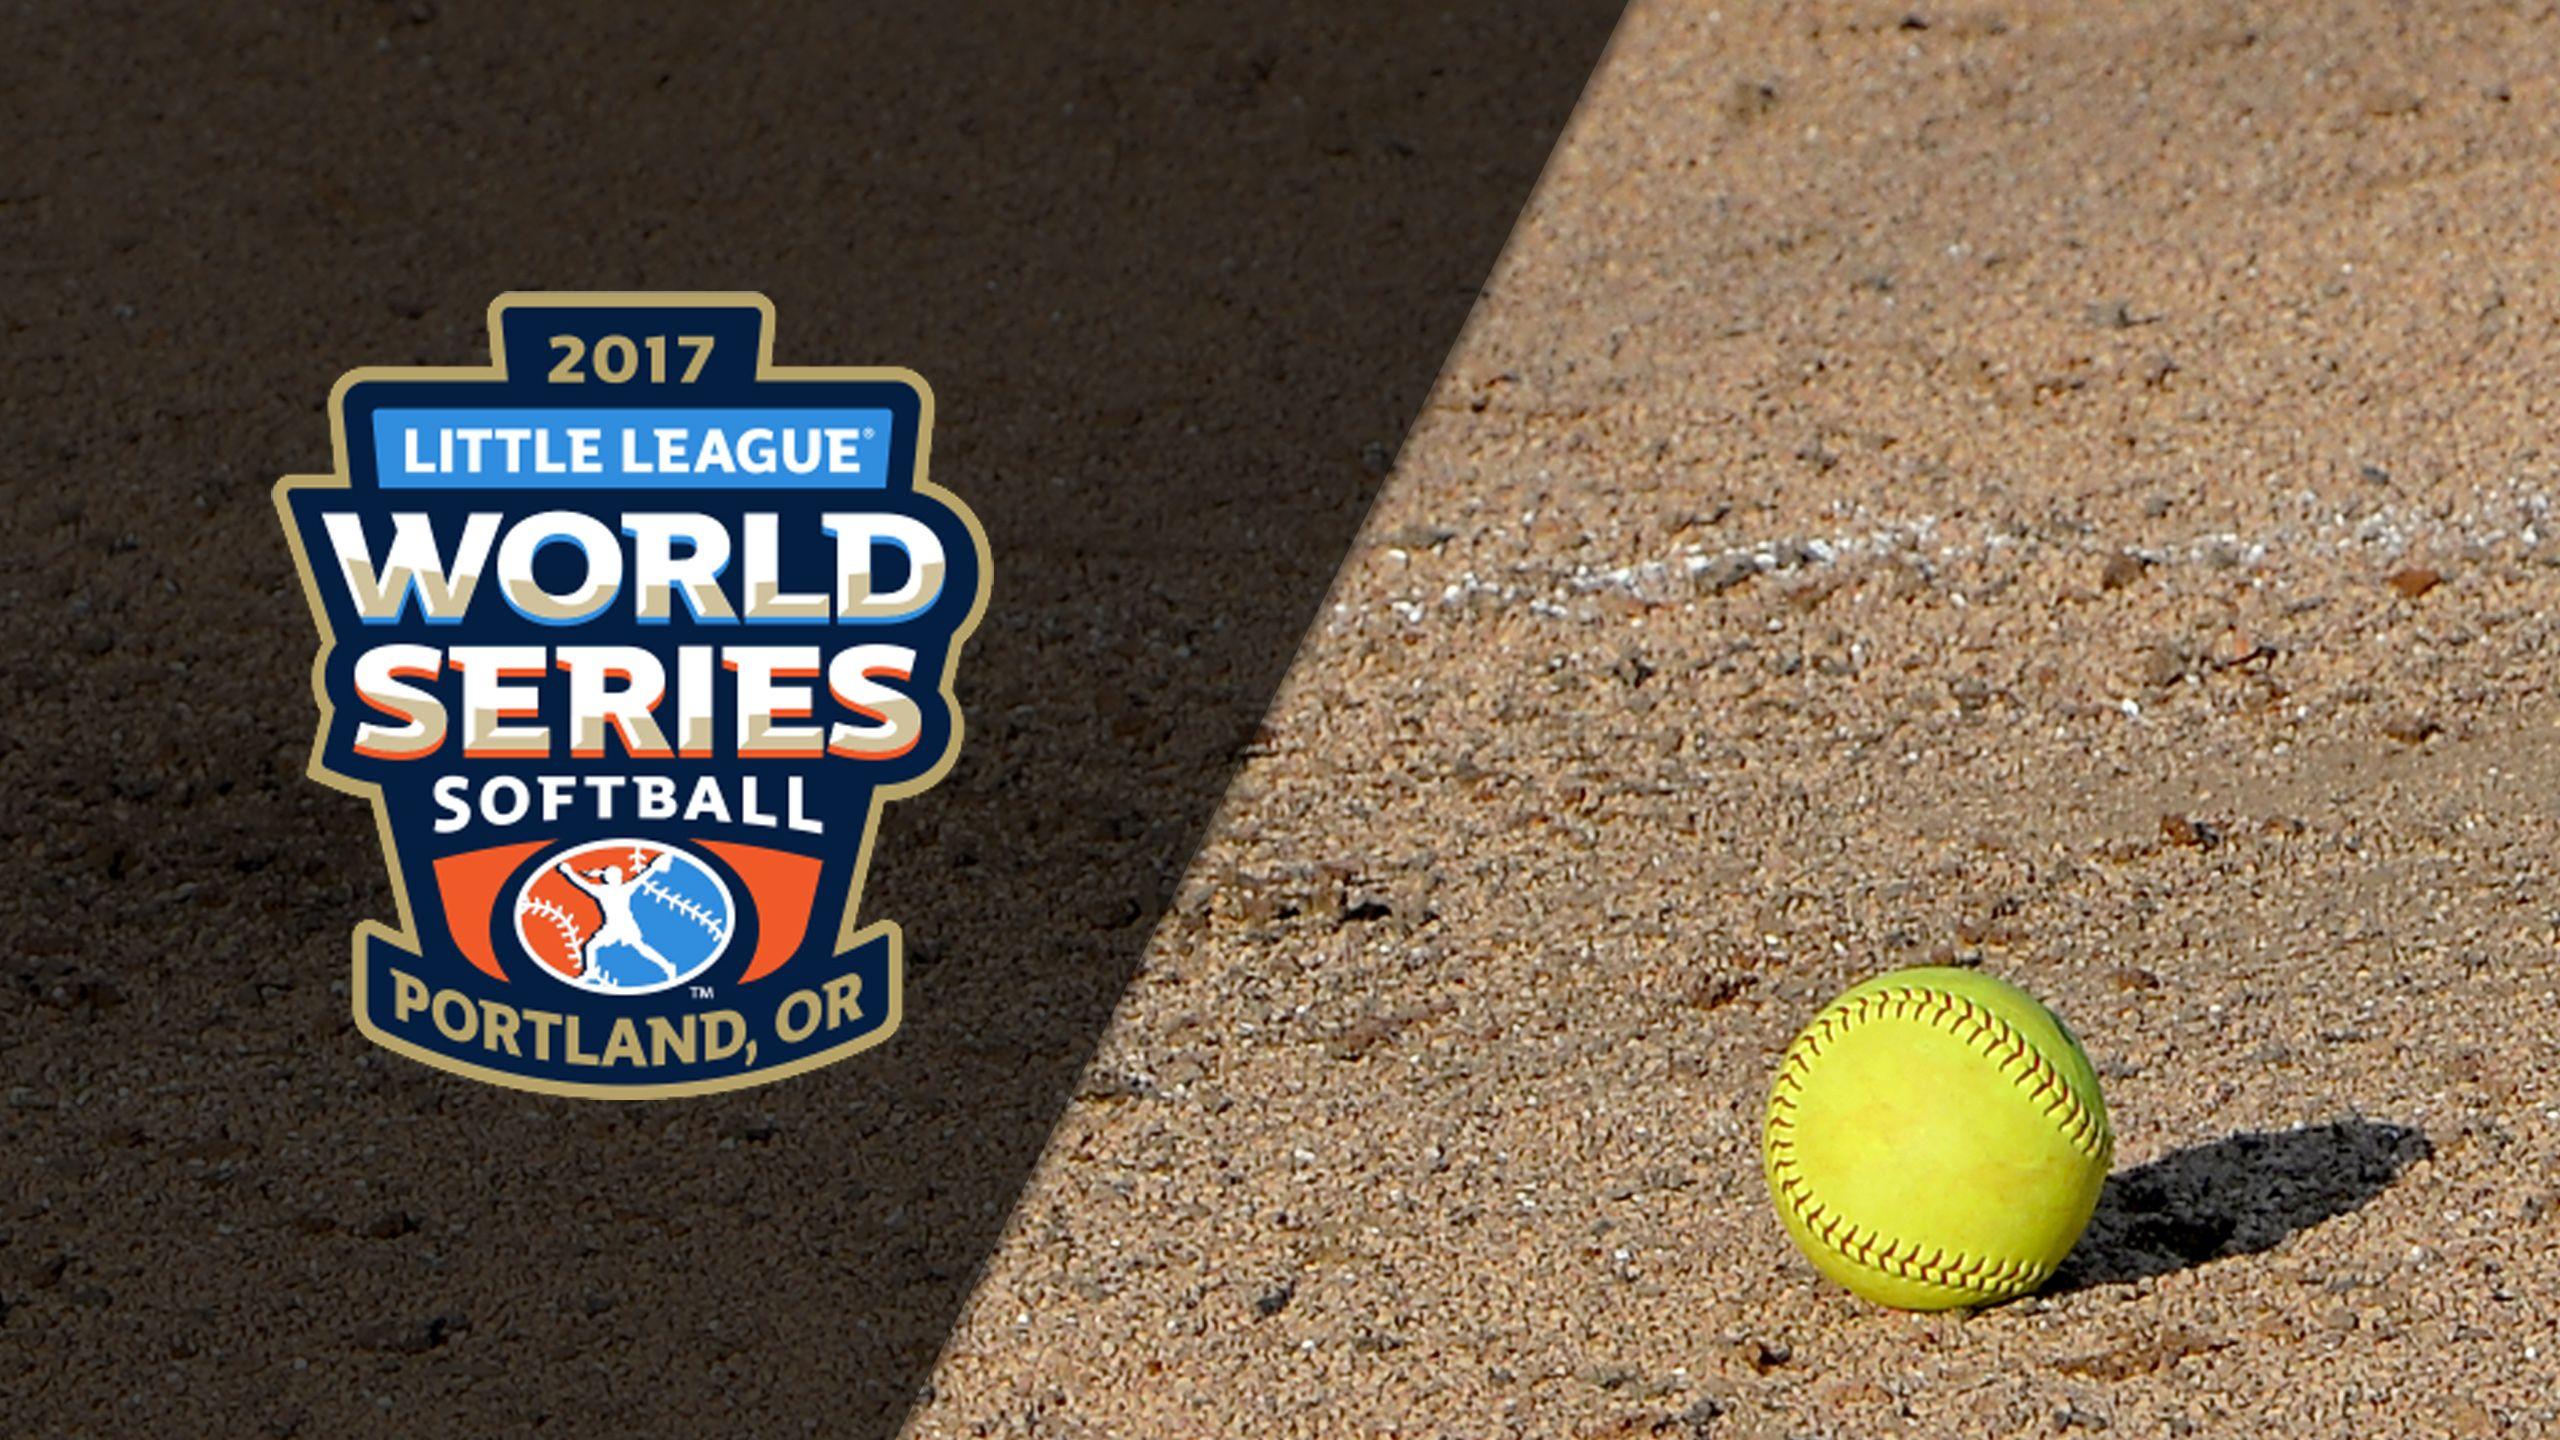 Bear, Delaware vs. WACO, Texas (Little League Softball World Series)